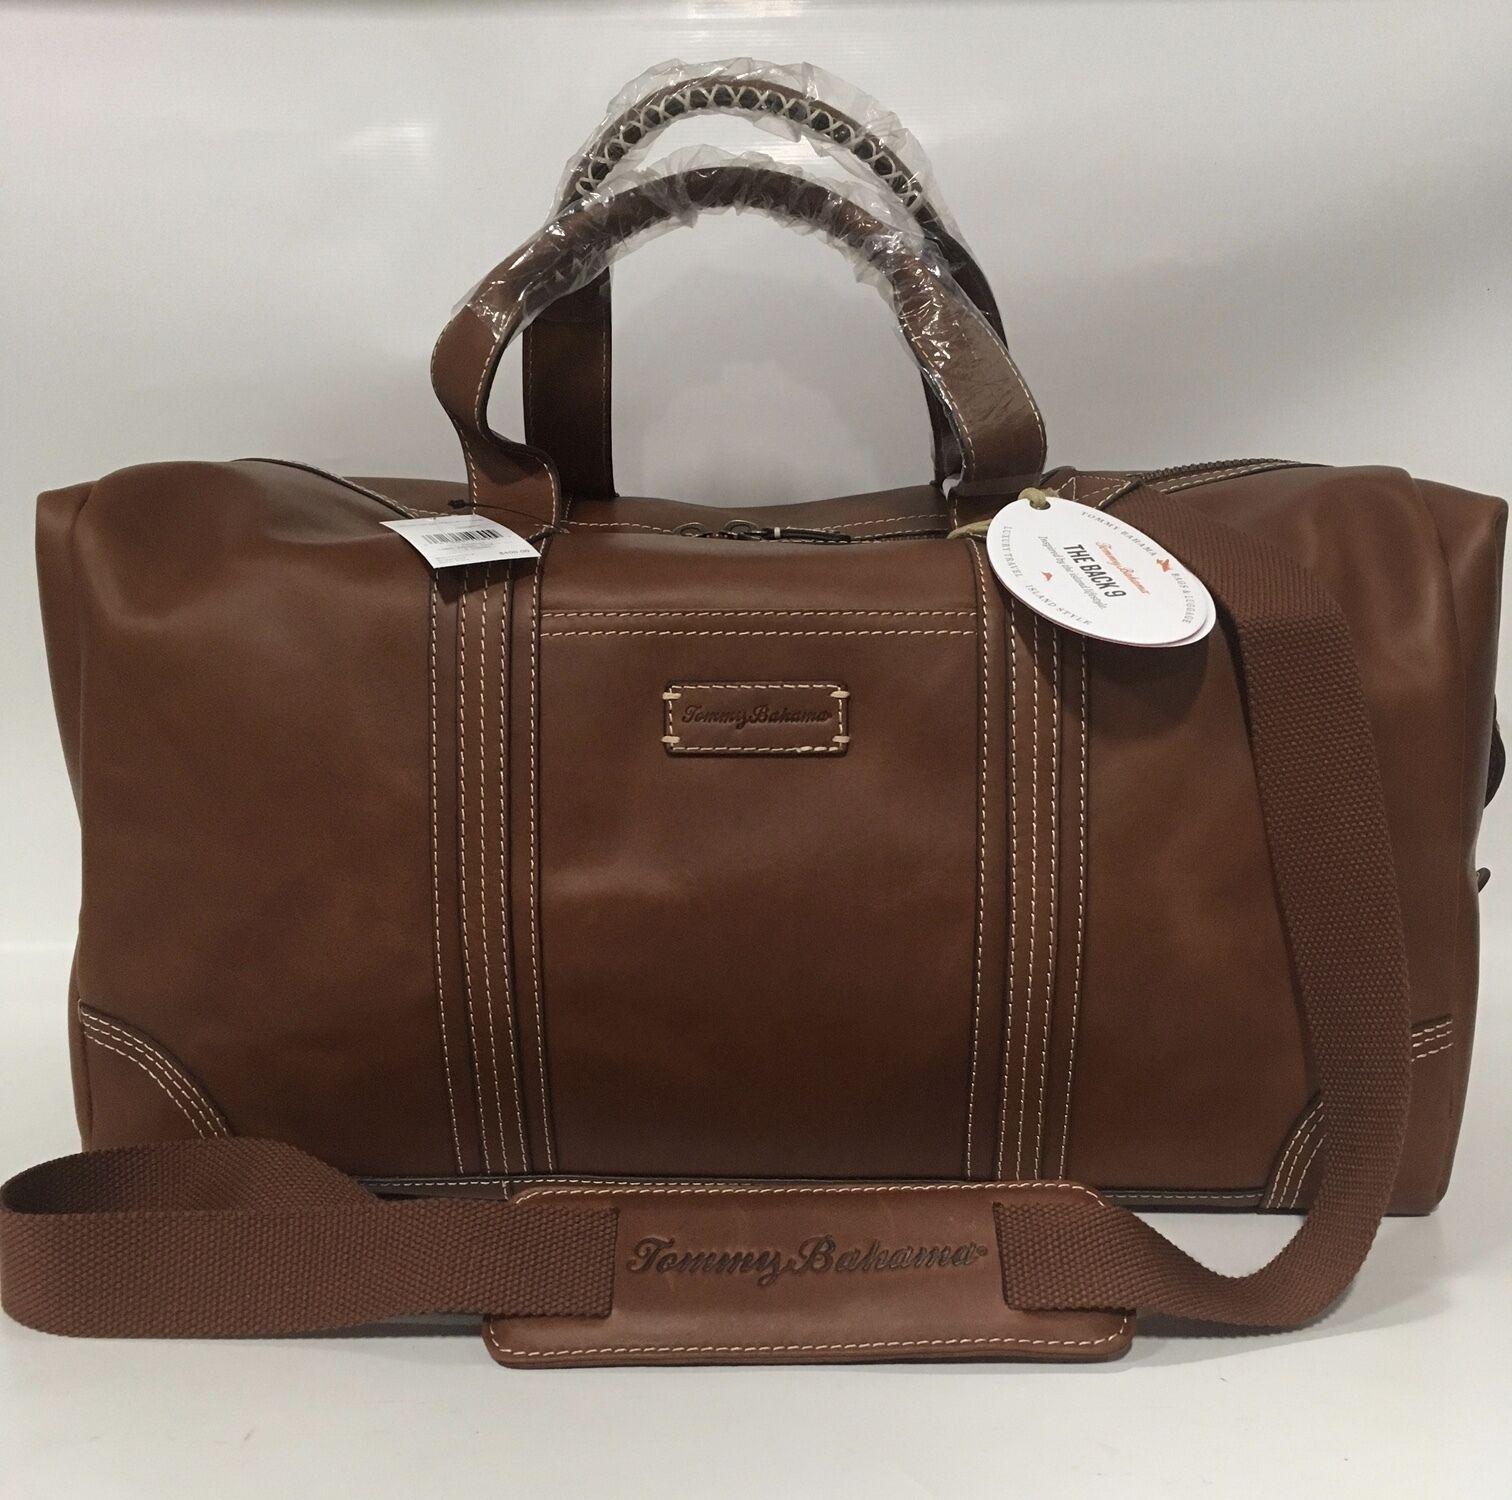 NEW TOMMY BAHAMA BACK 9 GENUINE LEATHER DUFFLE BAG COGNAC 400 DUFFEL - $300.00